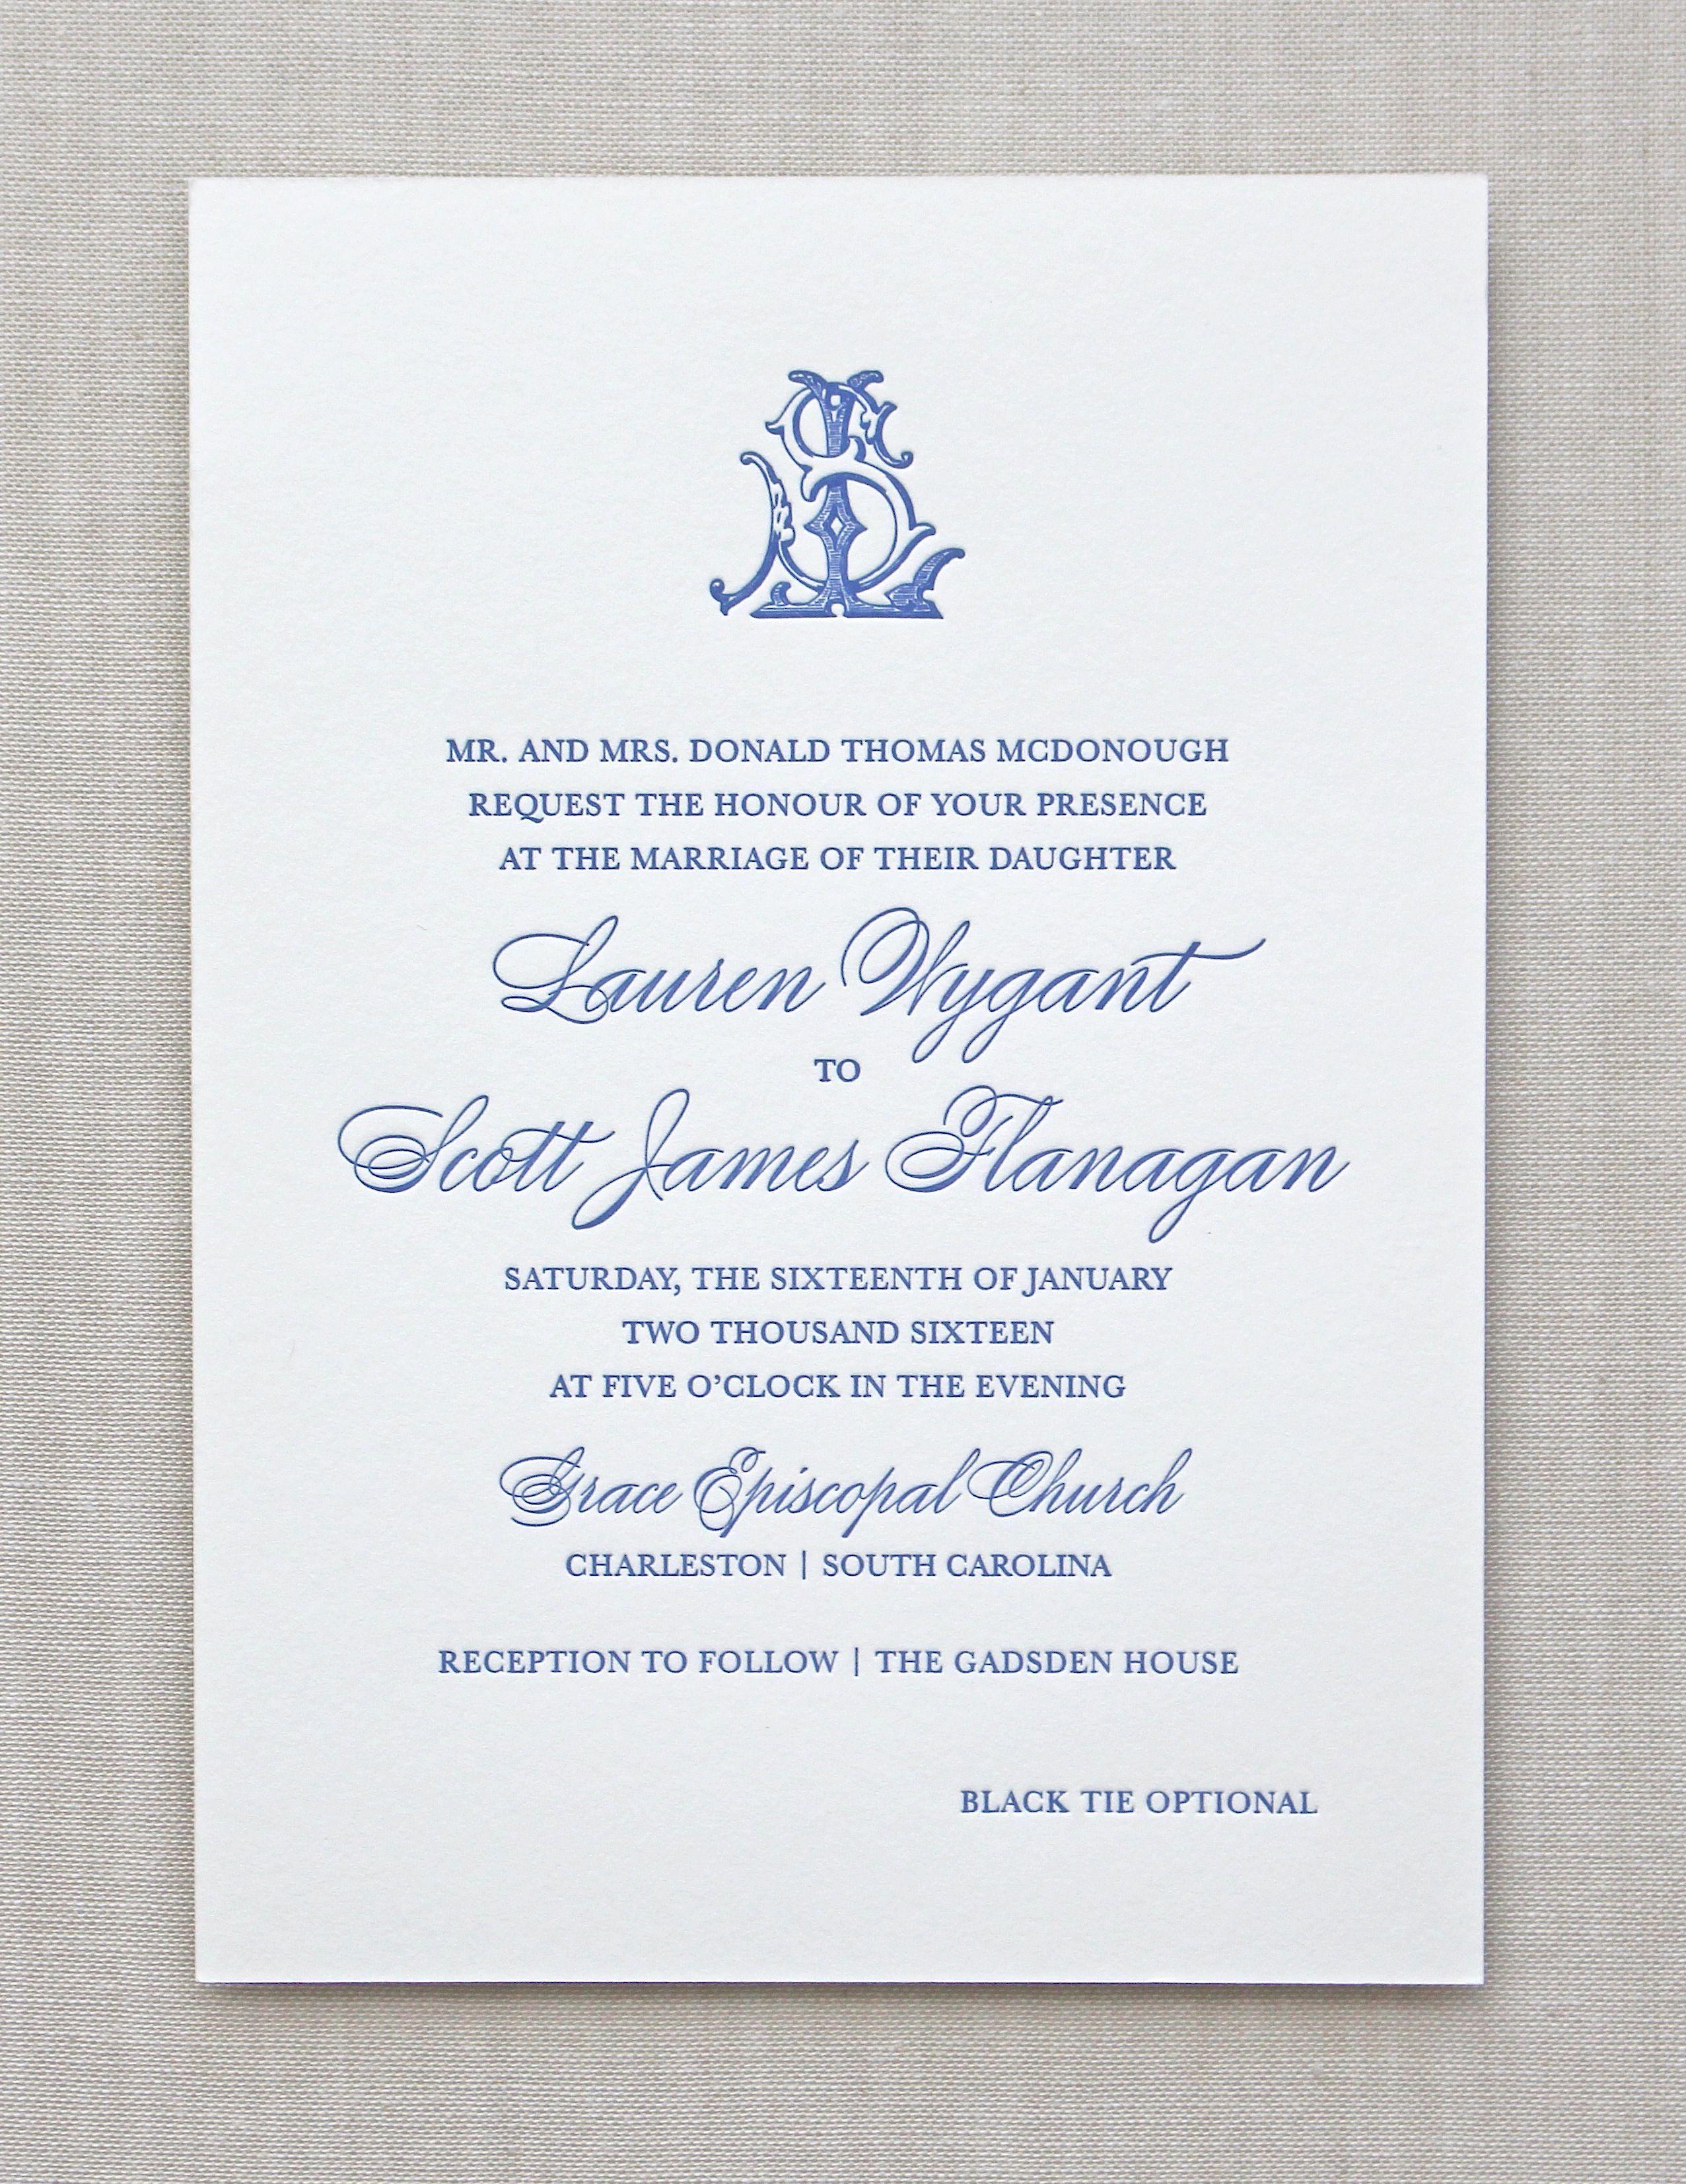 Letterpress Wedding Invitation / Charleston design / CHATHAM & CARON ...